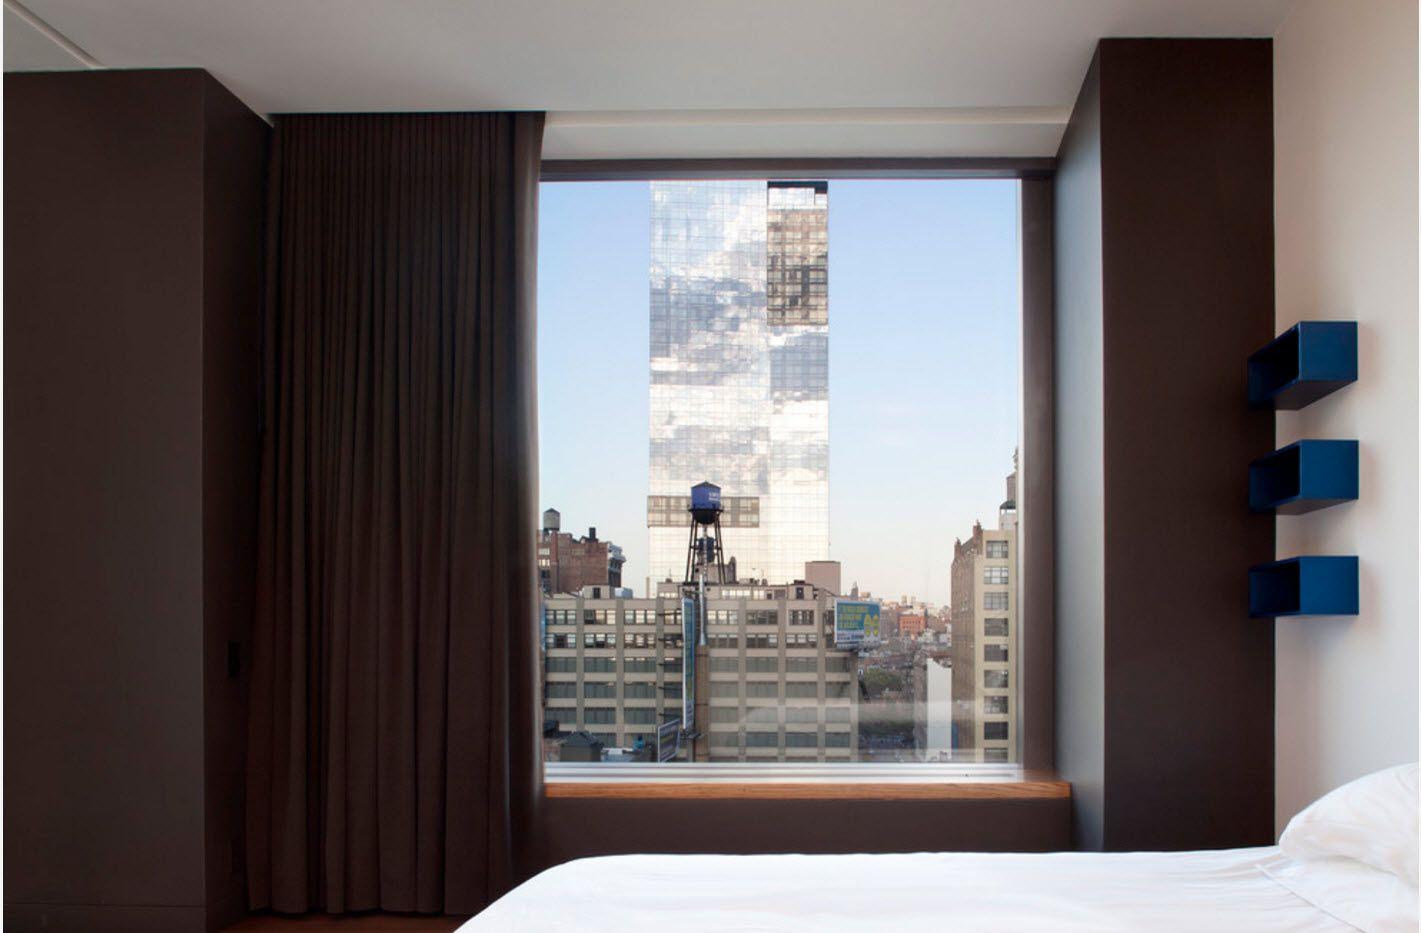 Modern urban interior with floor-to-ceiling blackout dark curtains